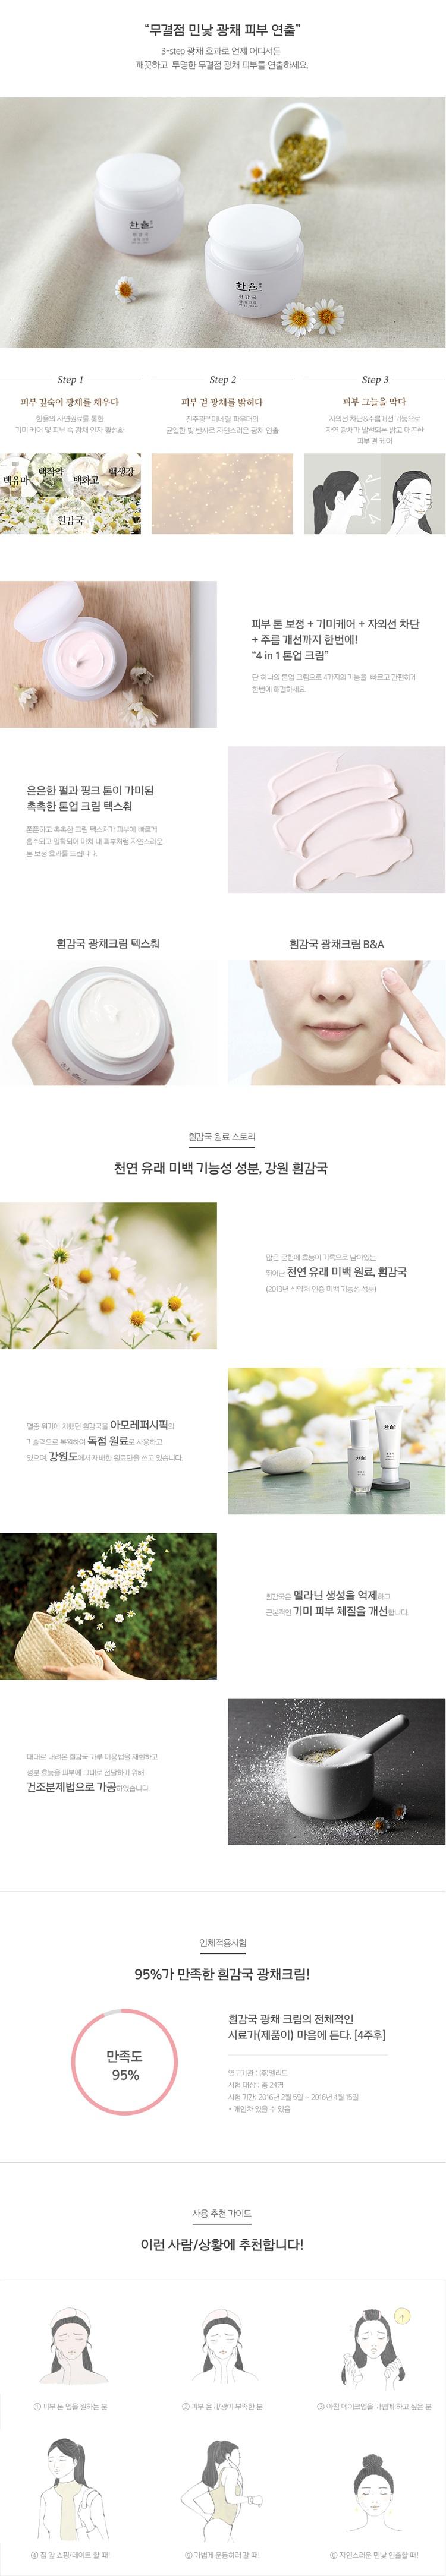 HanYul White Chrysanthemum Radiance Cream korean cosmetic makeup product online shop malaysia indonesia cambodia1